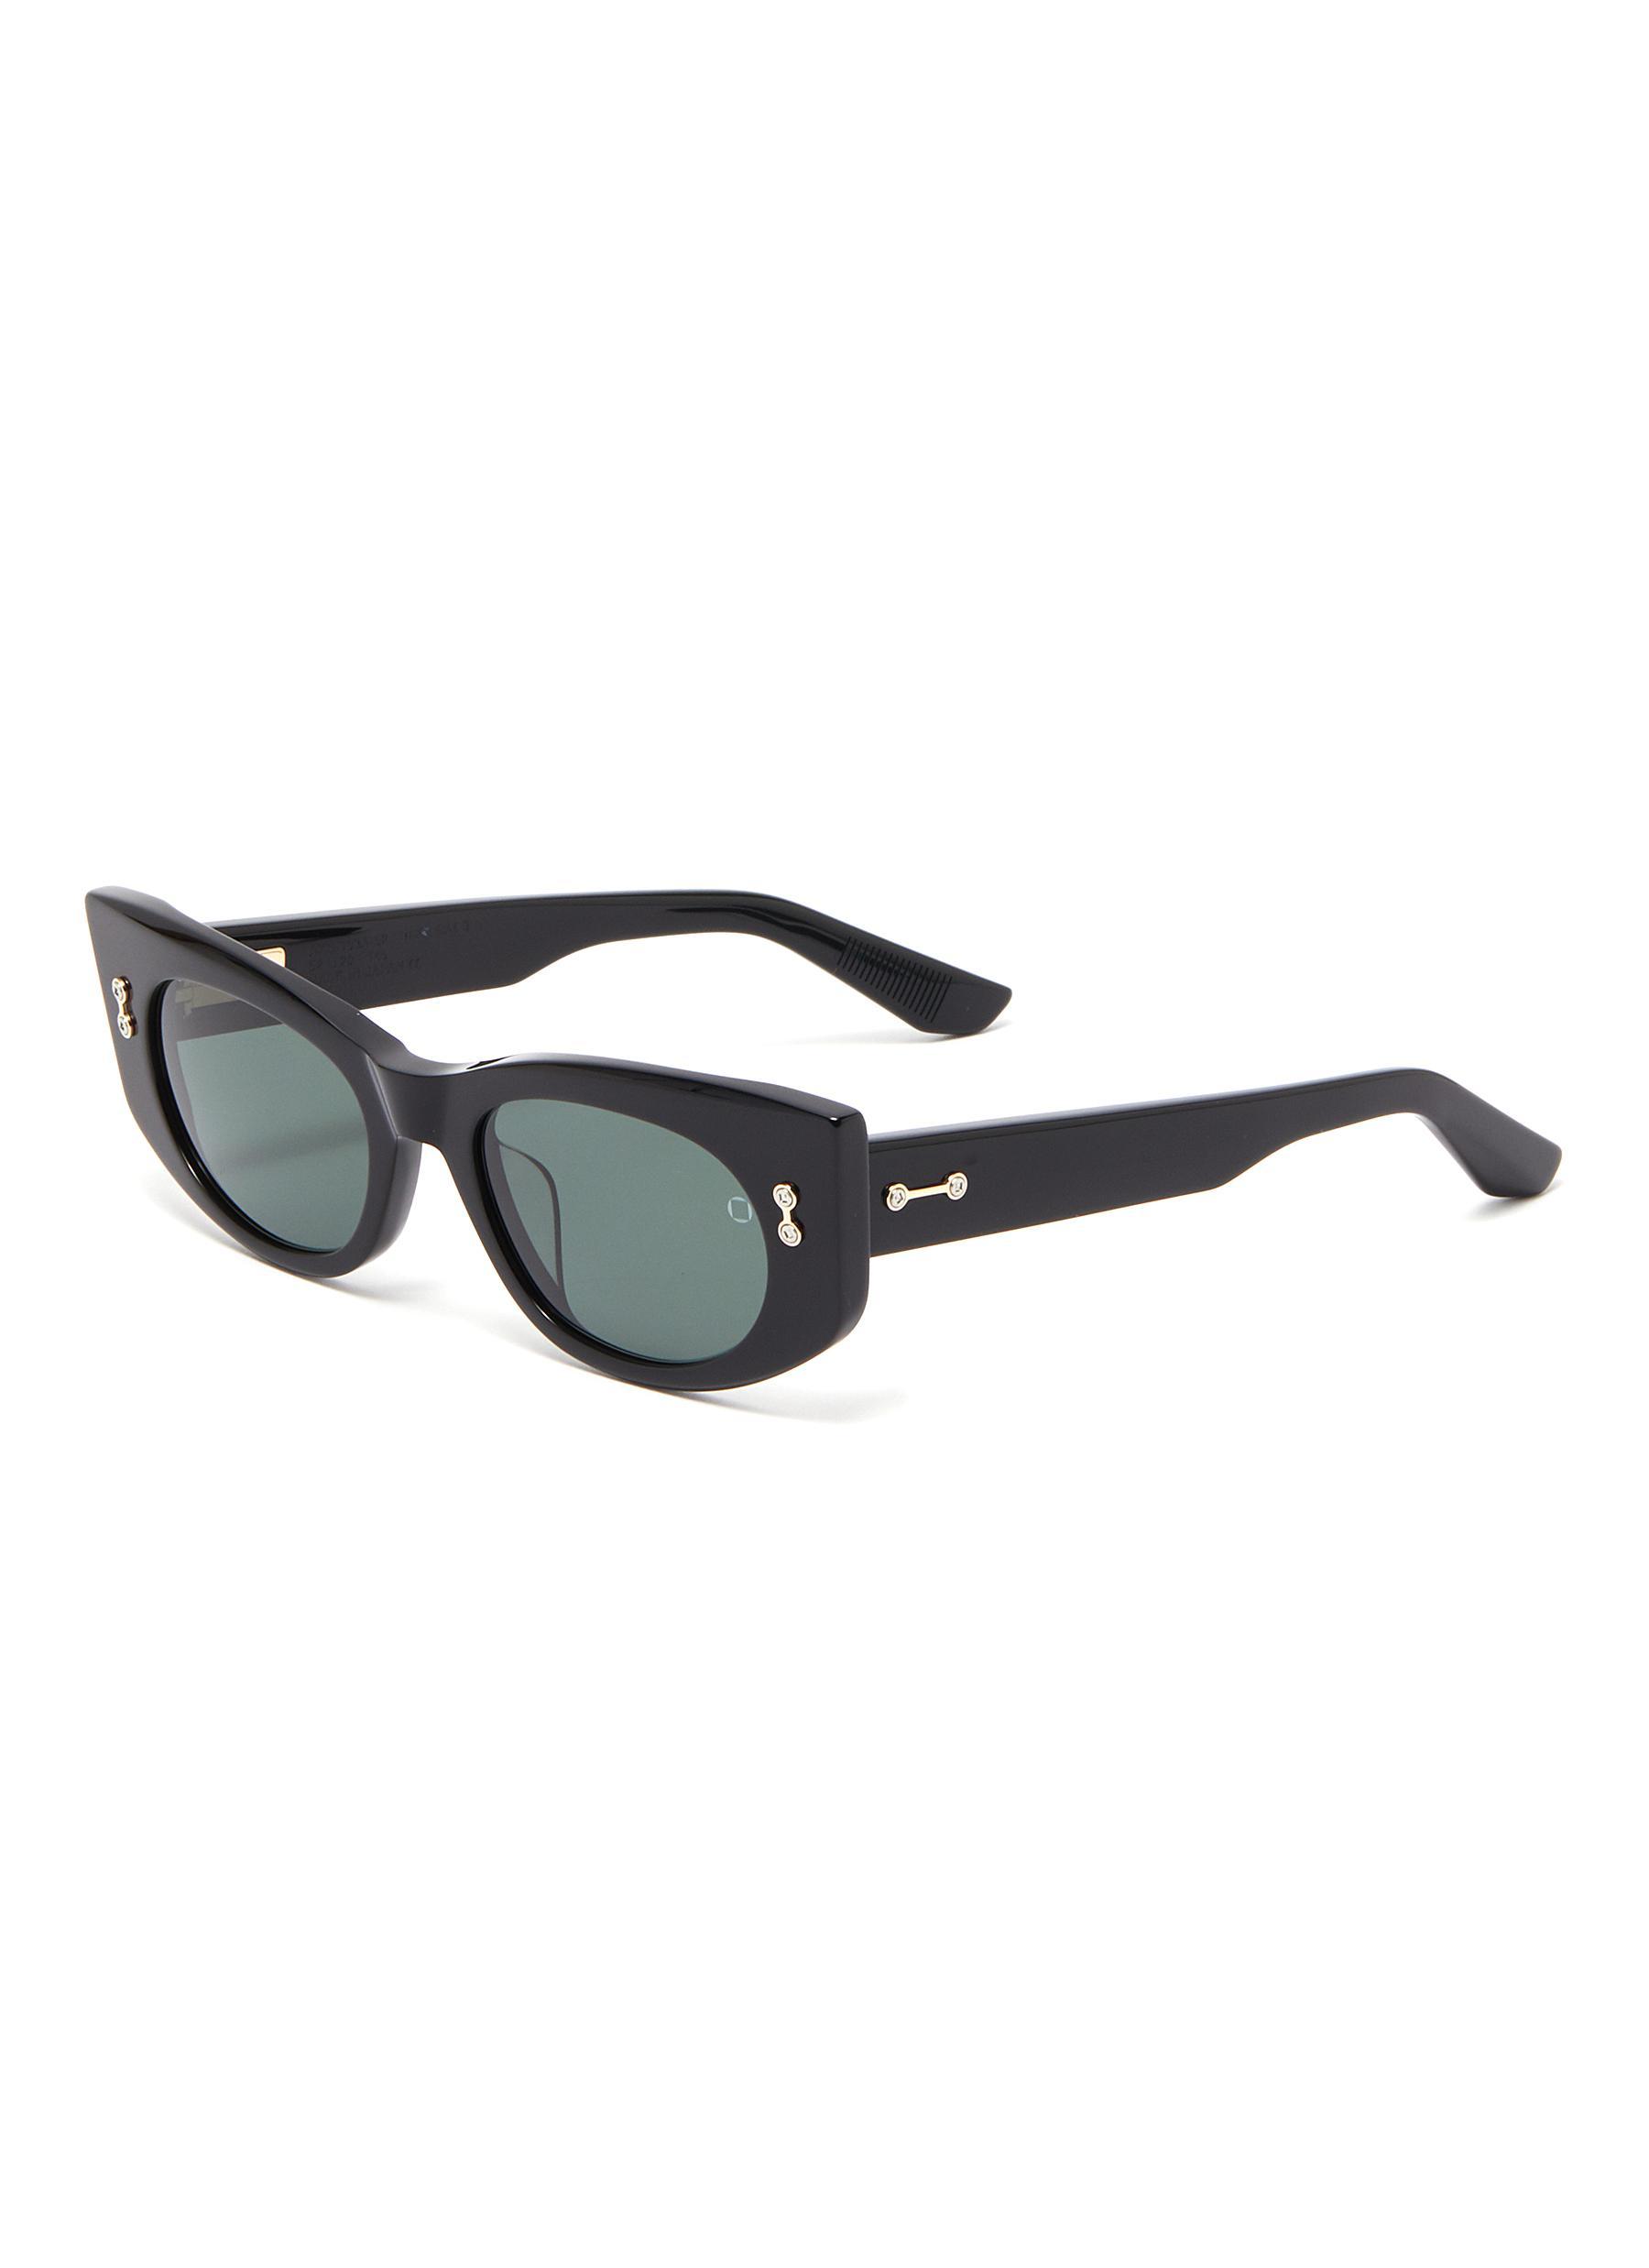 'Aquila' acetate frame oval sunglasses